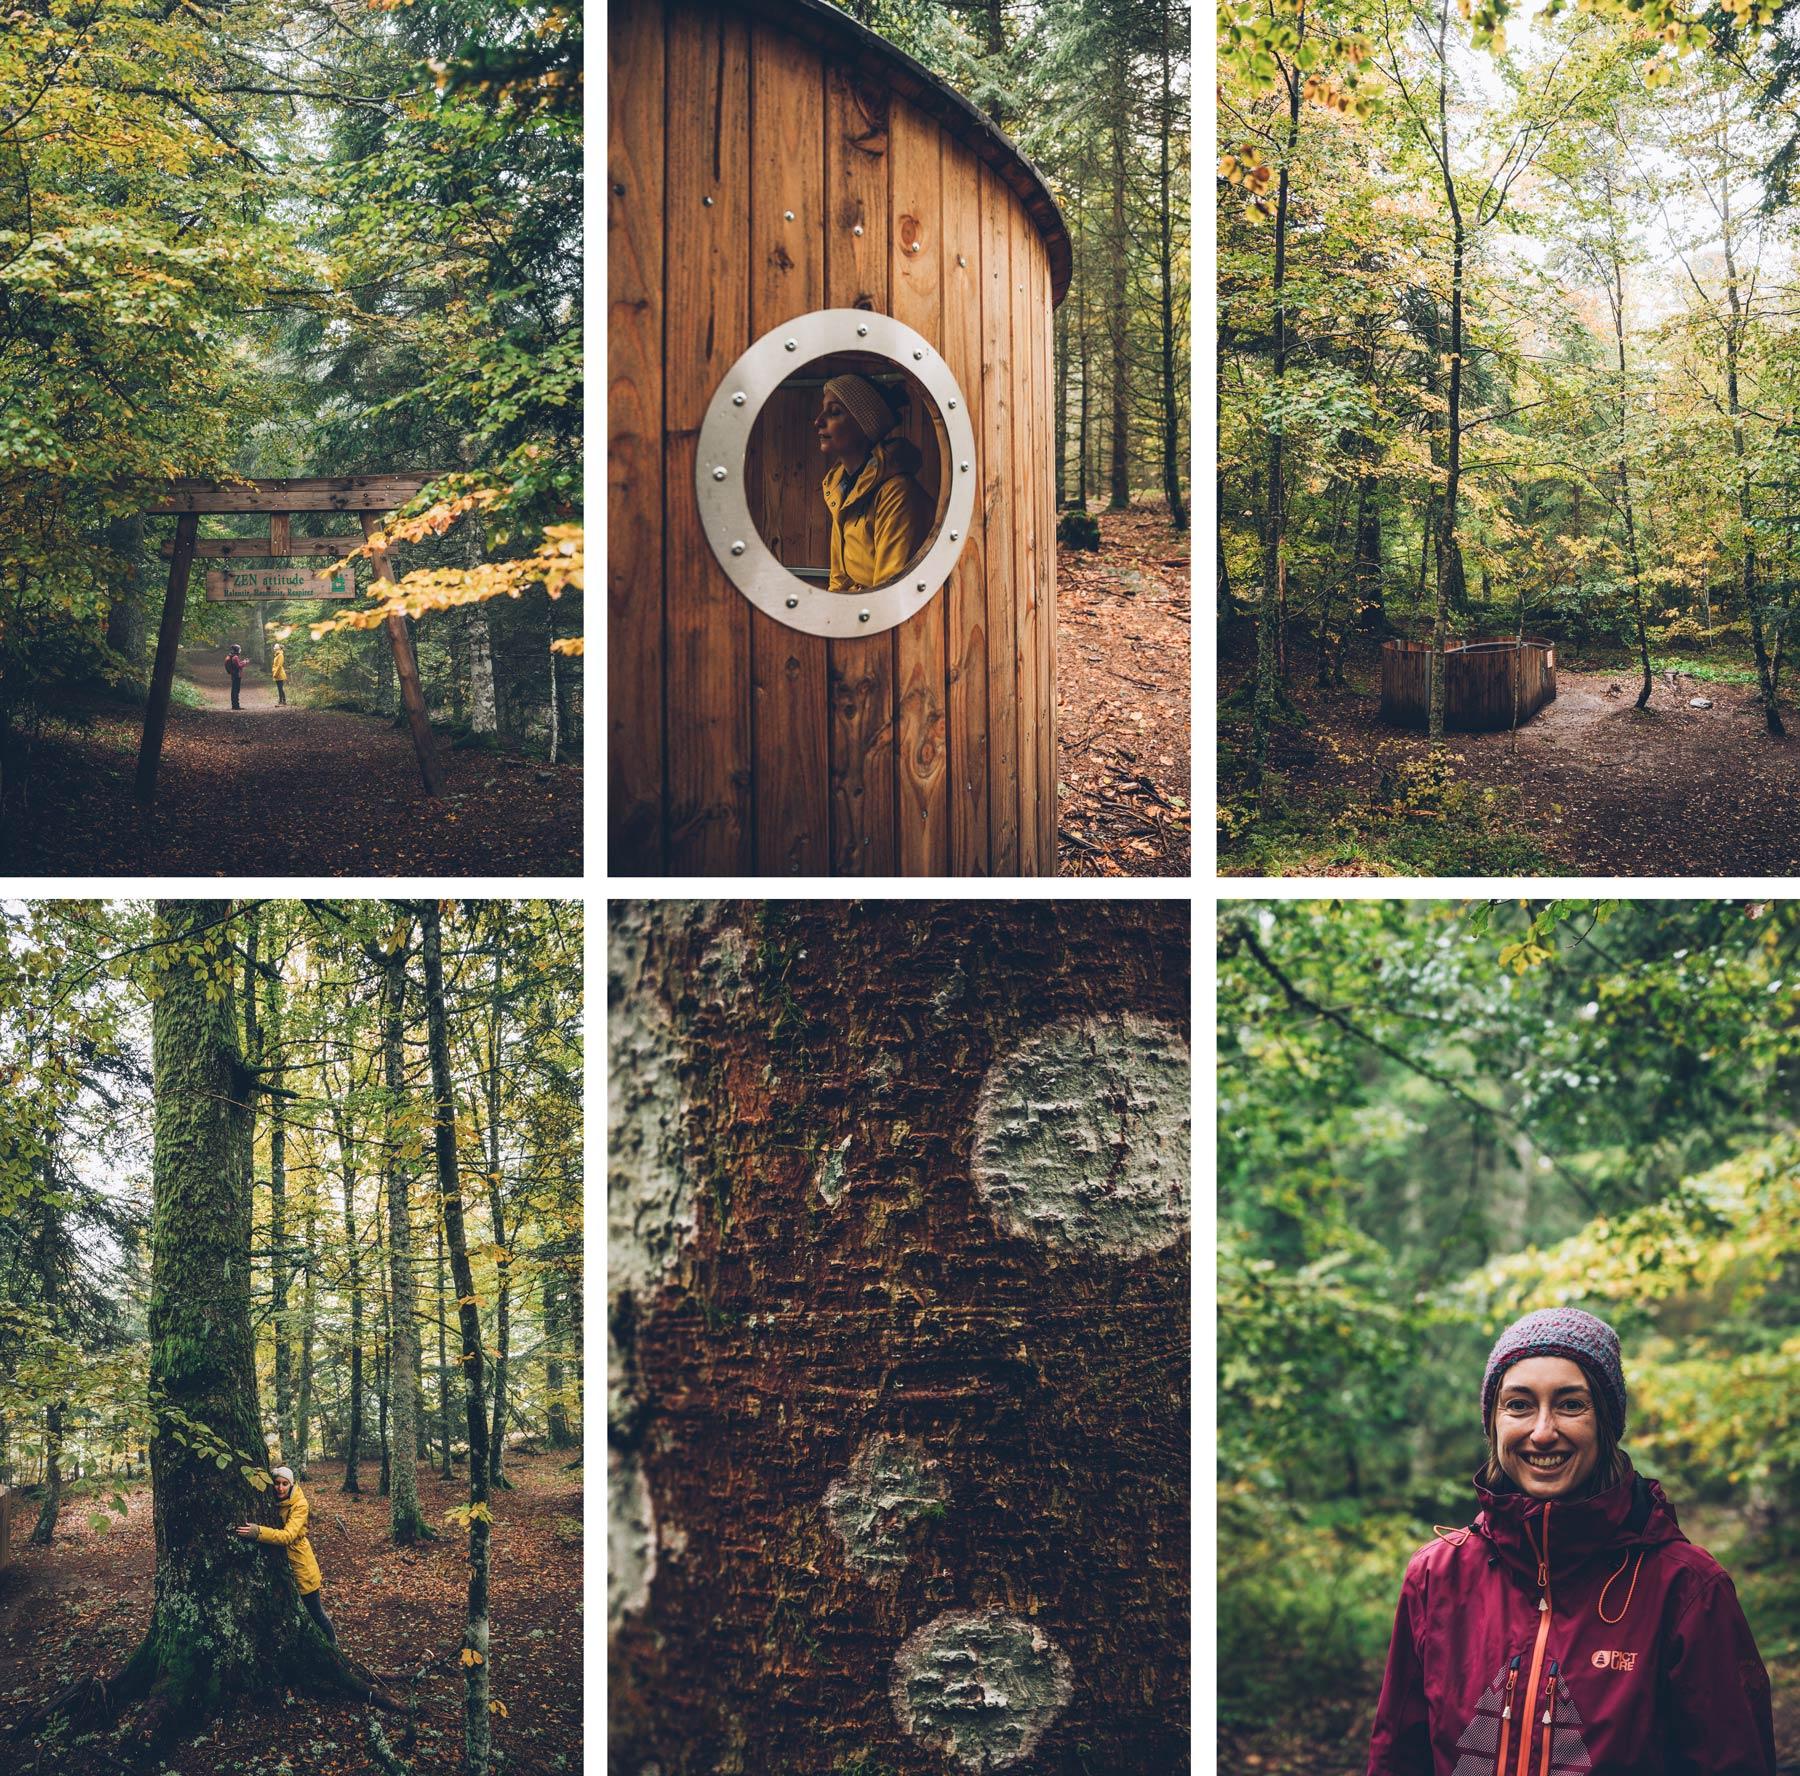 Spa Forestier, Mont-Dore, Auvergne